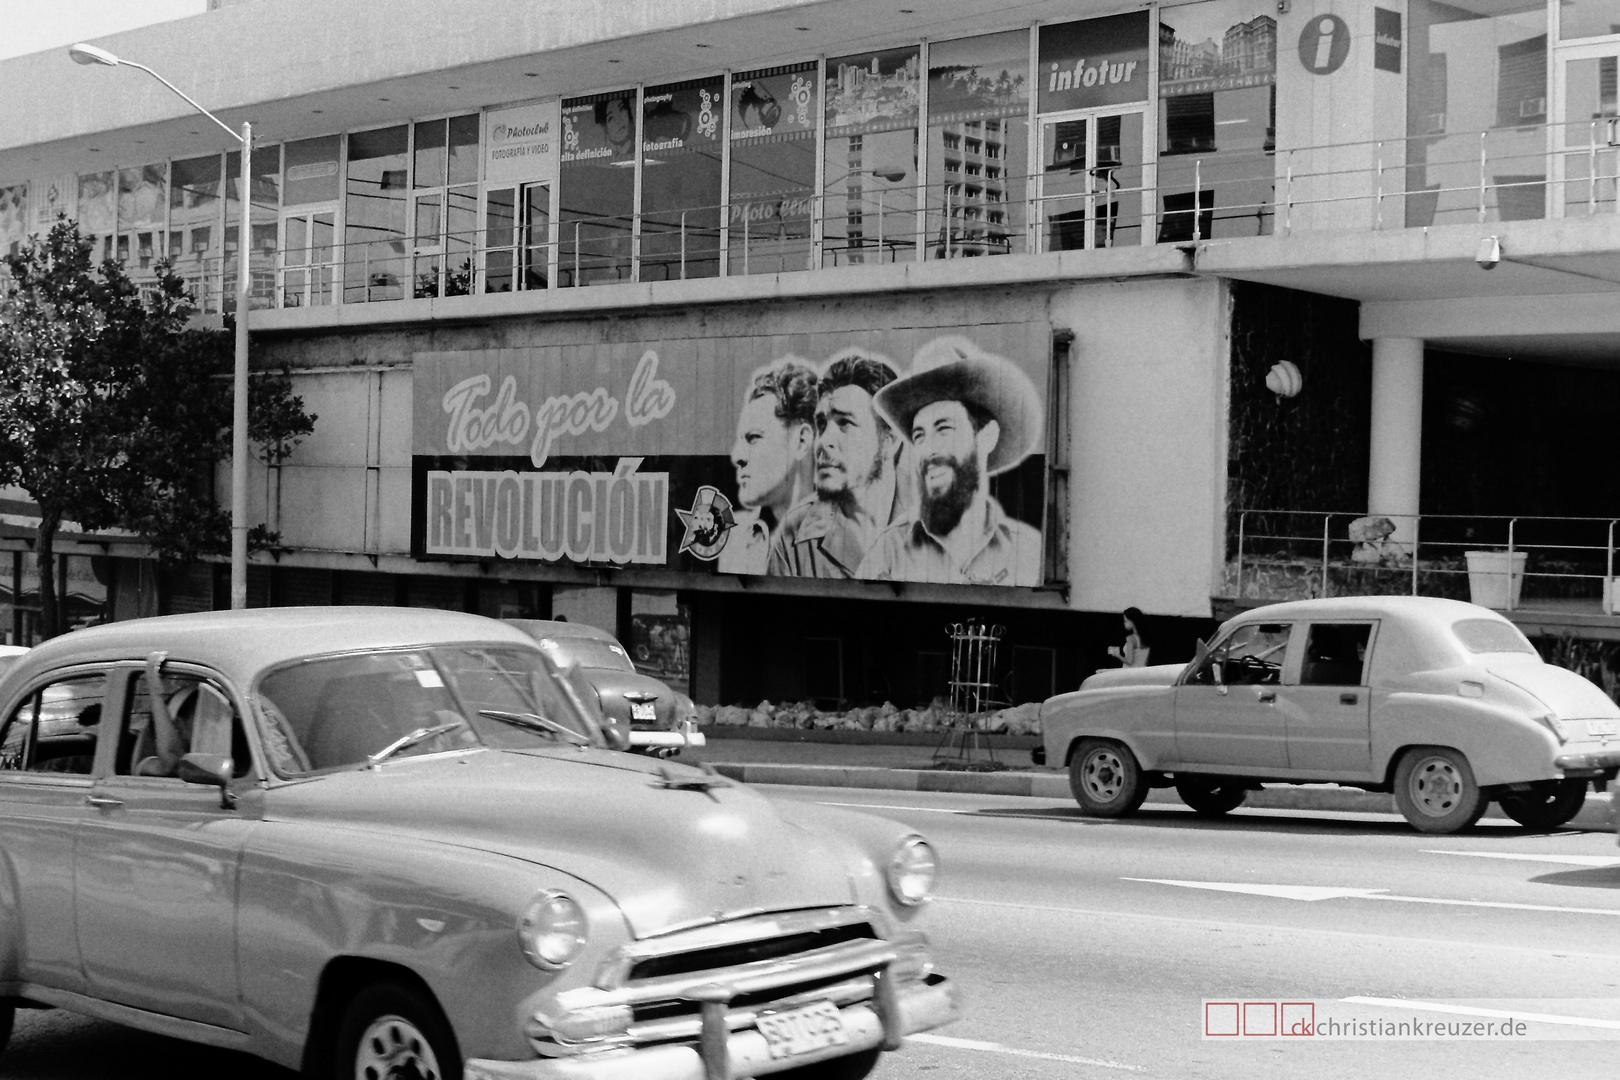 Revolucion Havanna Cuba